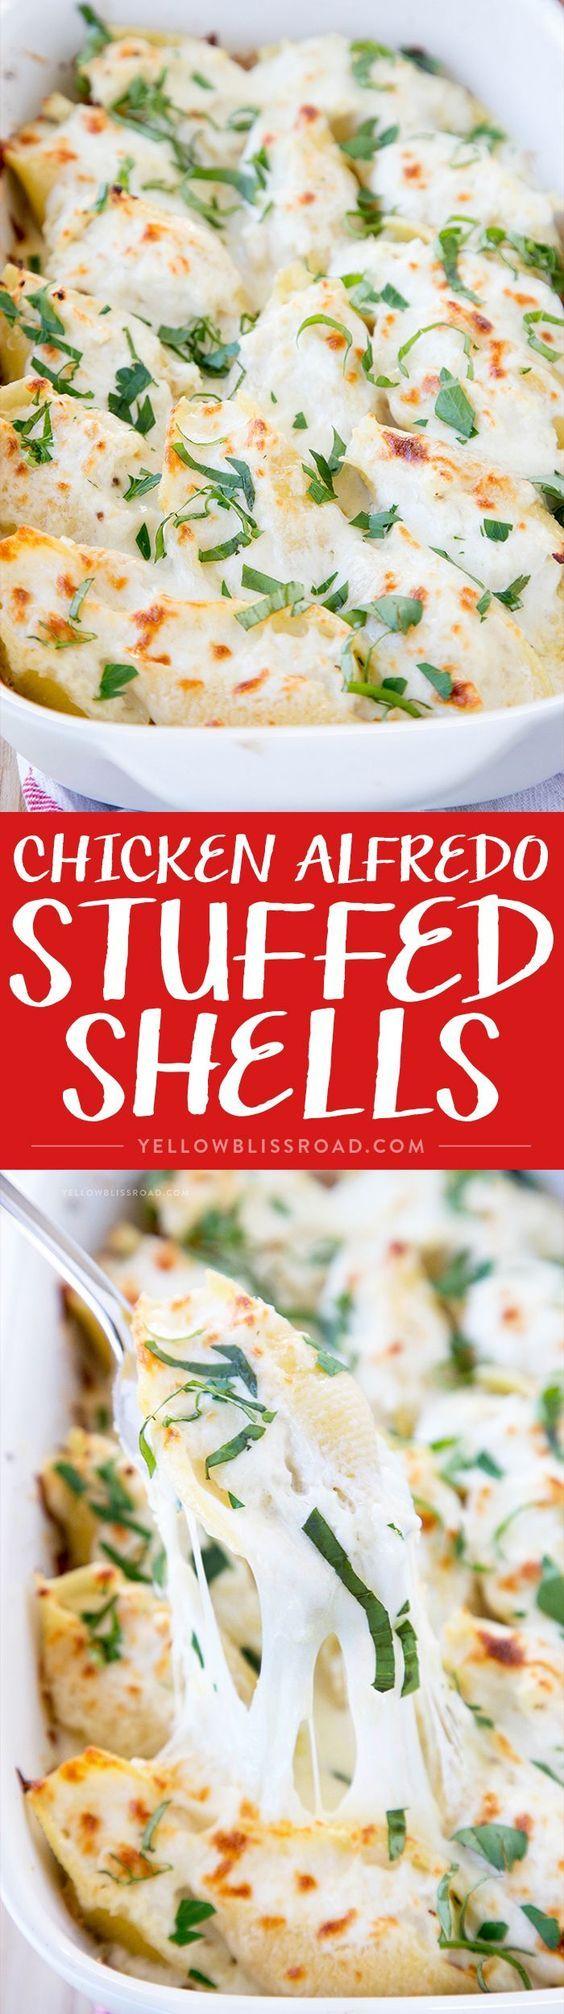 1000+ ideas about Baked Stuffed Shells on Pinterest | Lidia Bastianich ...